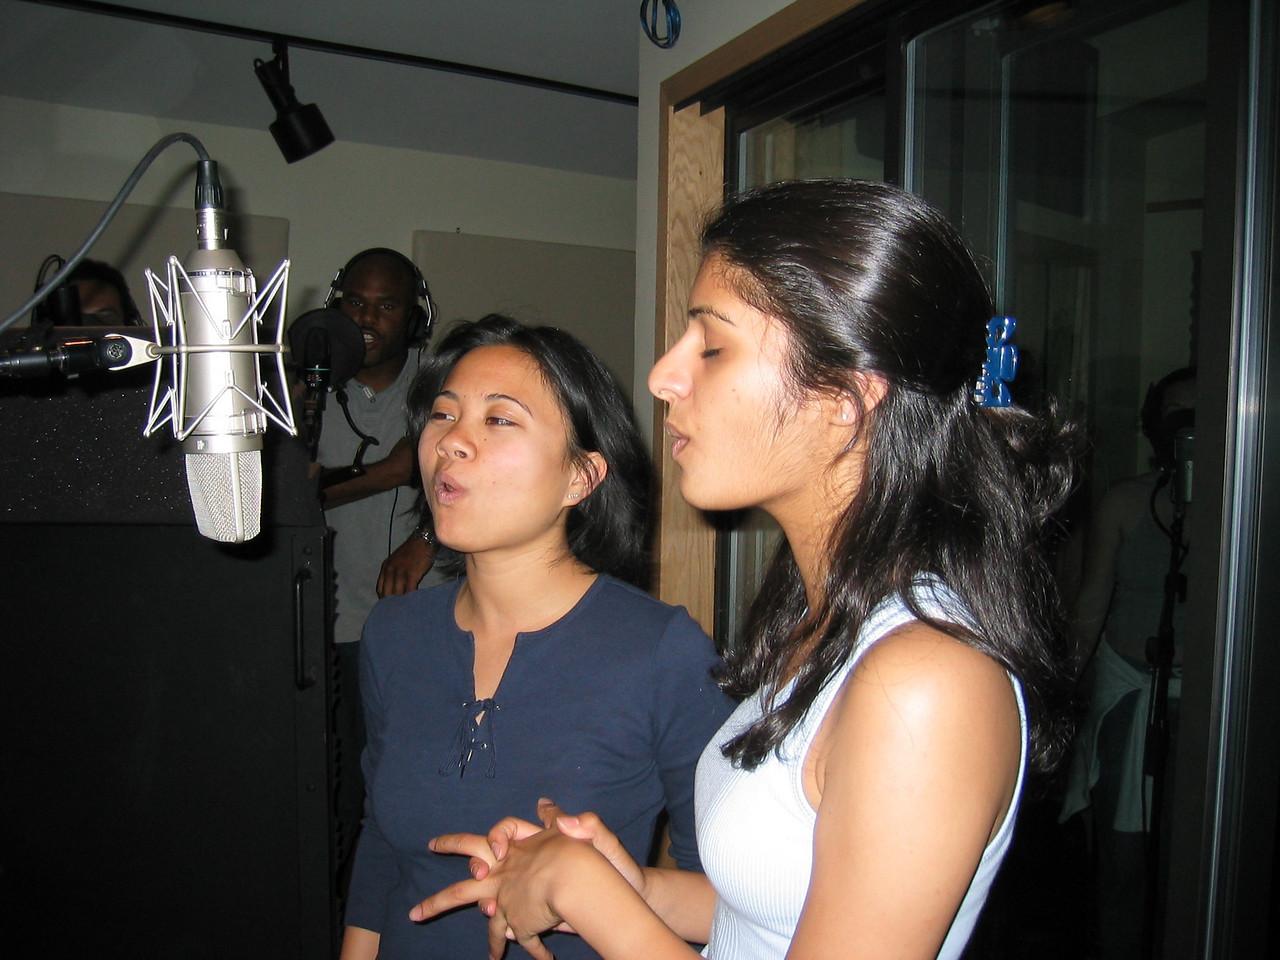 Malbert VP, Cristina & Shaila ooo